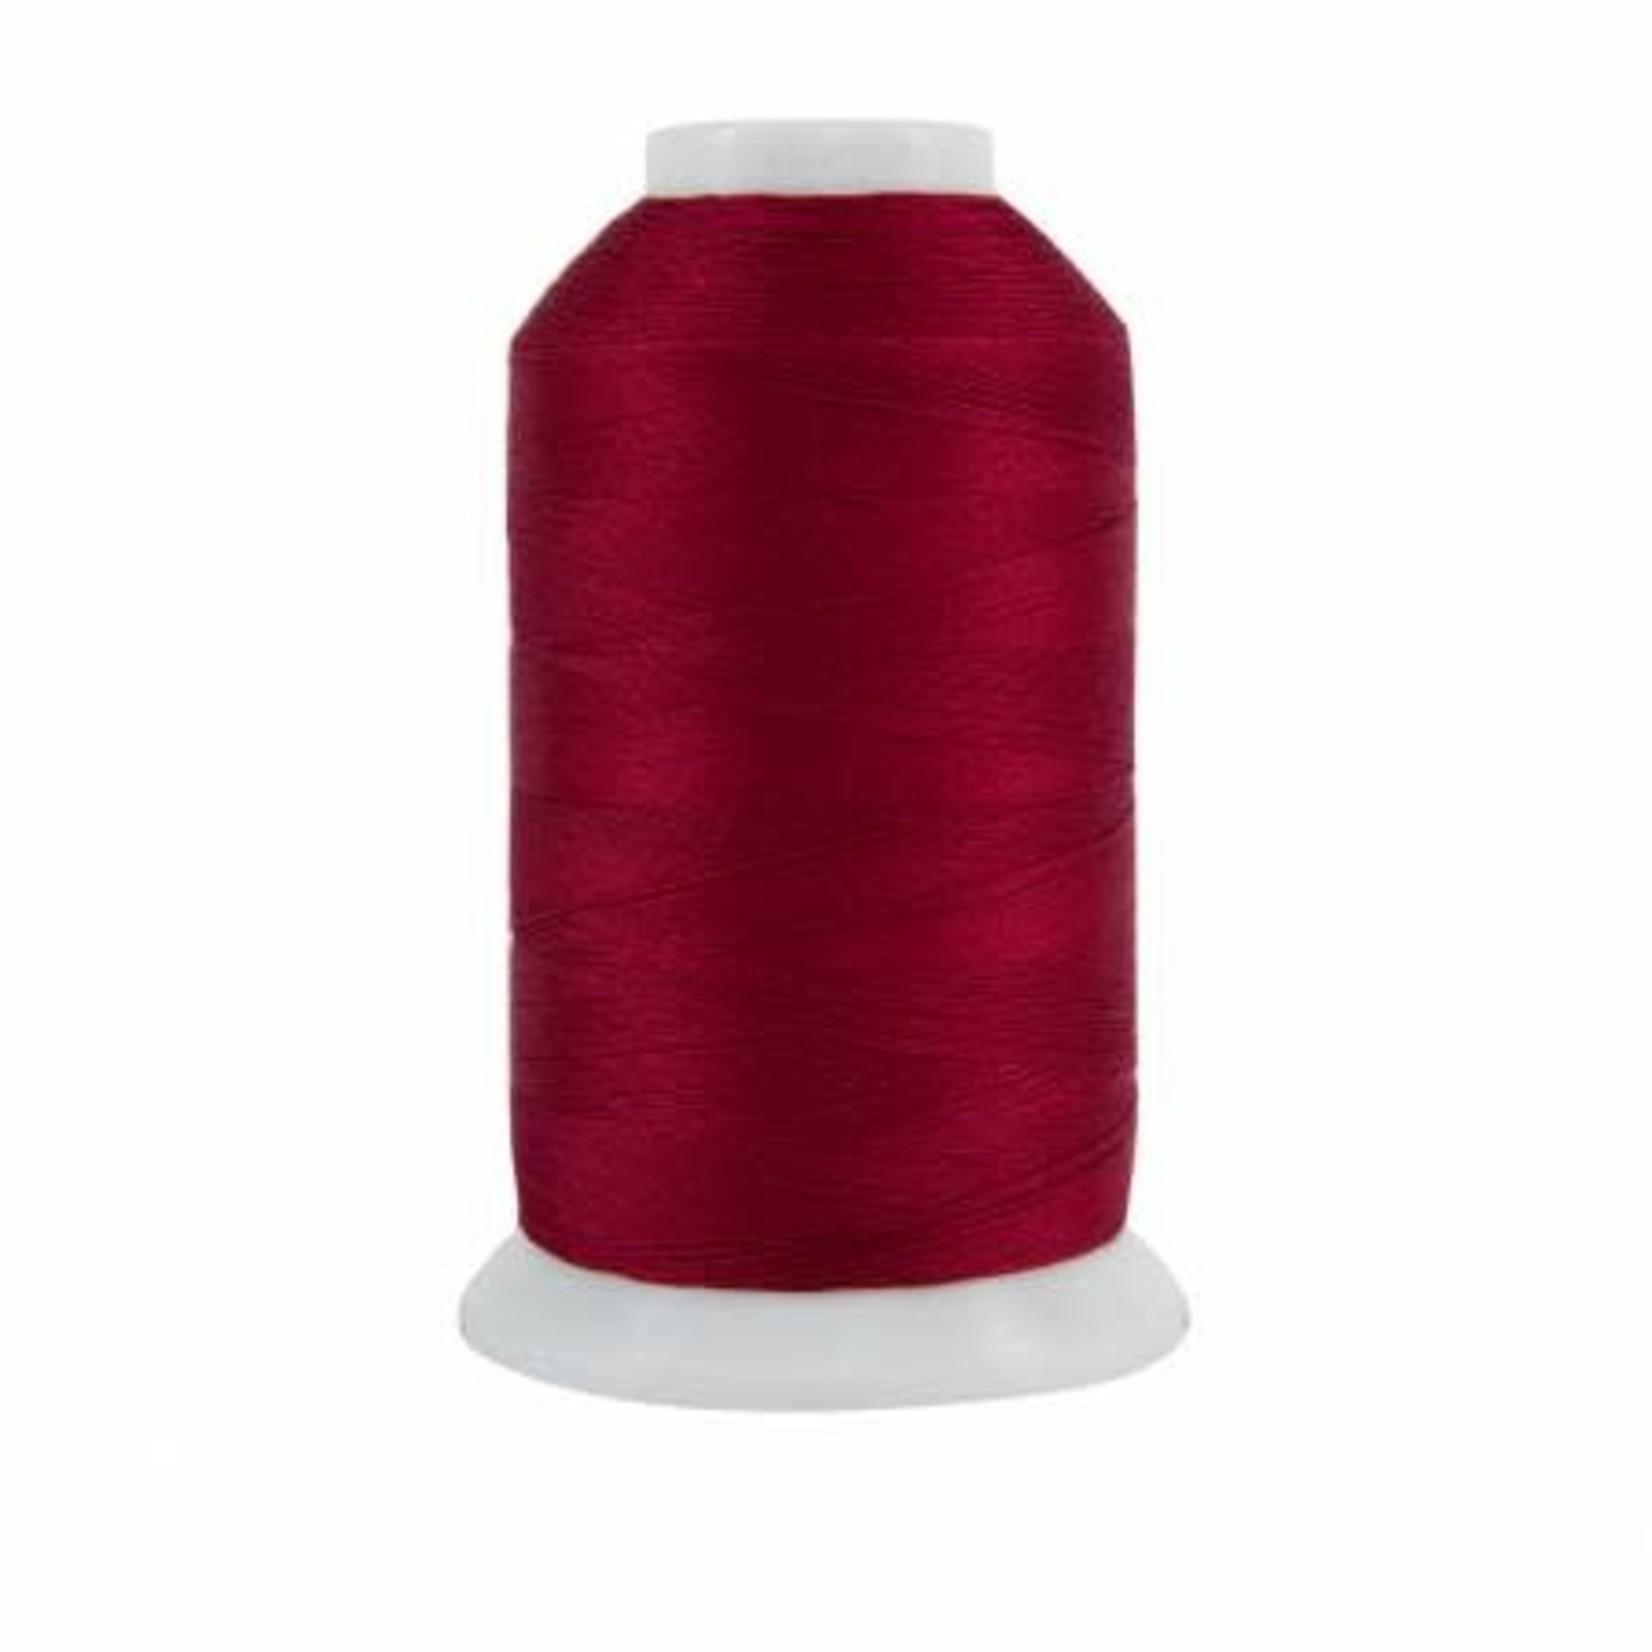 Superior Threads King Tut - #40 - 1828 m - 1034 Robin Red